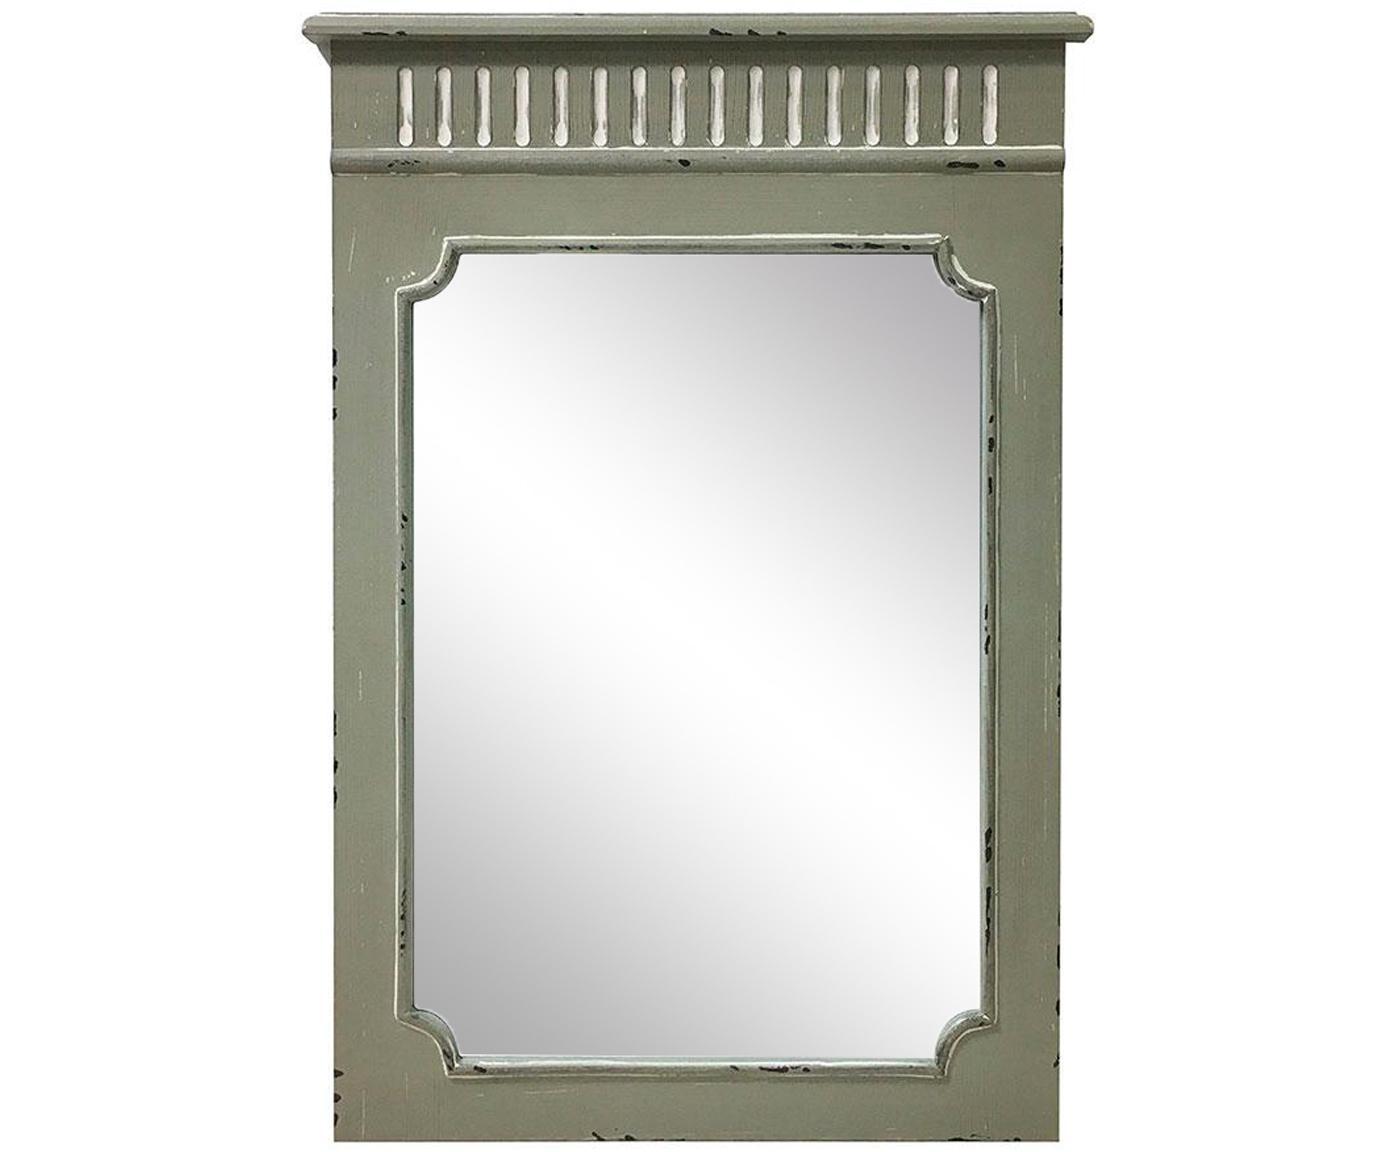 Espejo de pared Rocio, Espejo: cristal, Beige, An 50 x Al 70 cm